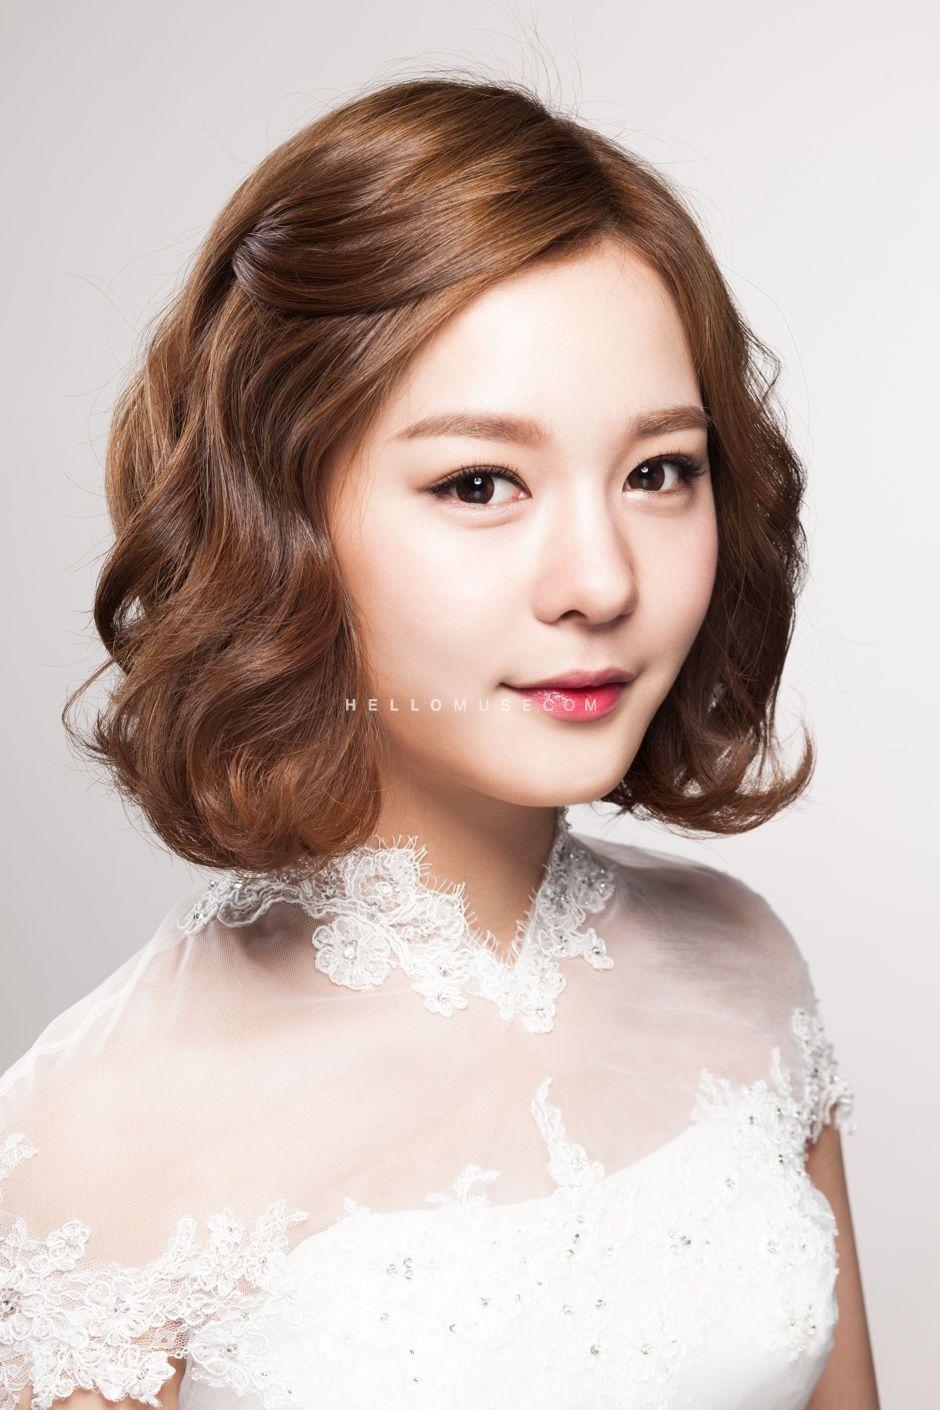 Pre Wedding Korea Hair And Makeup Hellomuse Com Korea Pre Wedding Promotion In 2020 Short Hair Bride Short Wedding Hair Short Bridal Hair